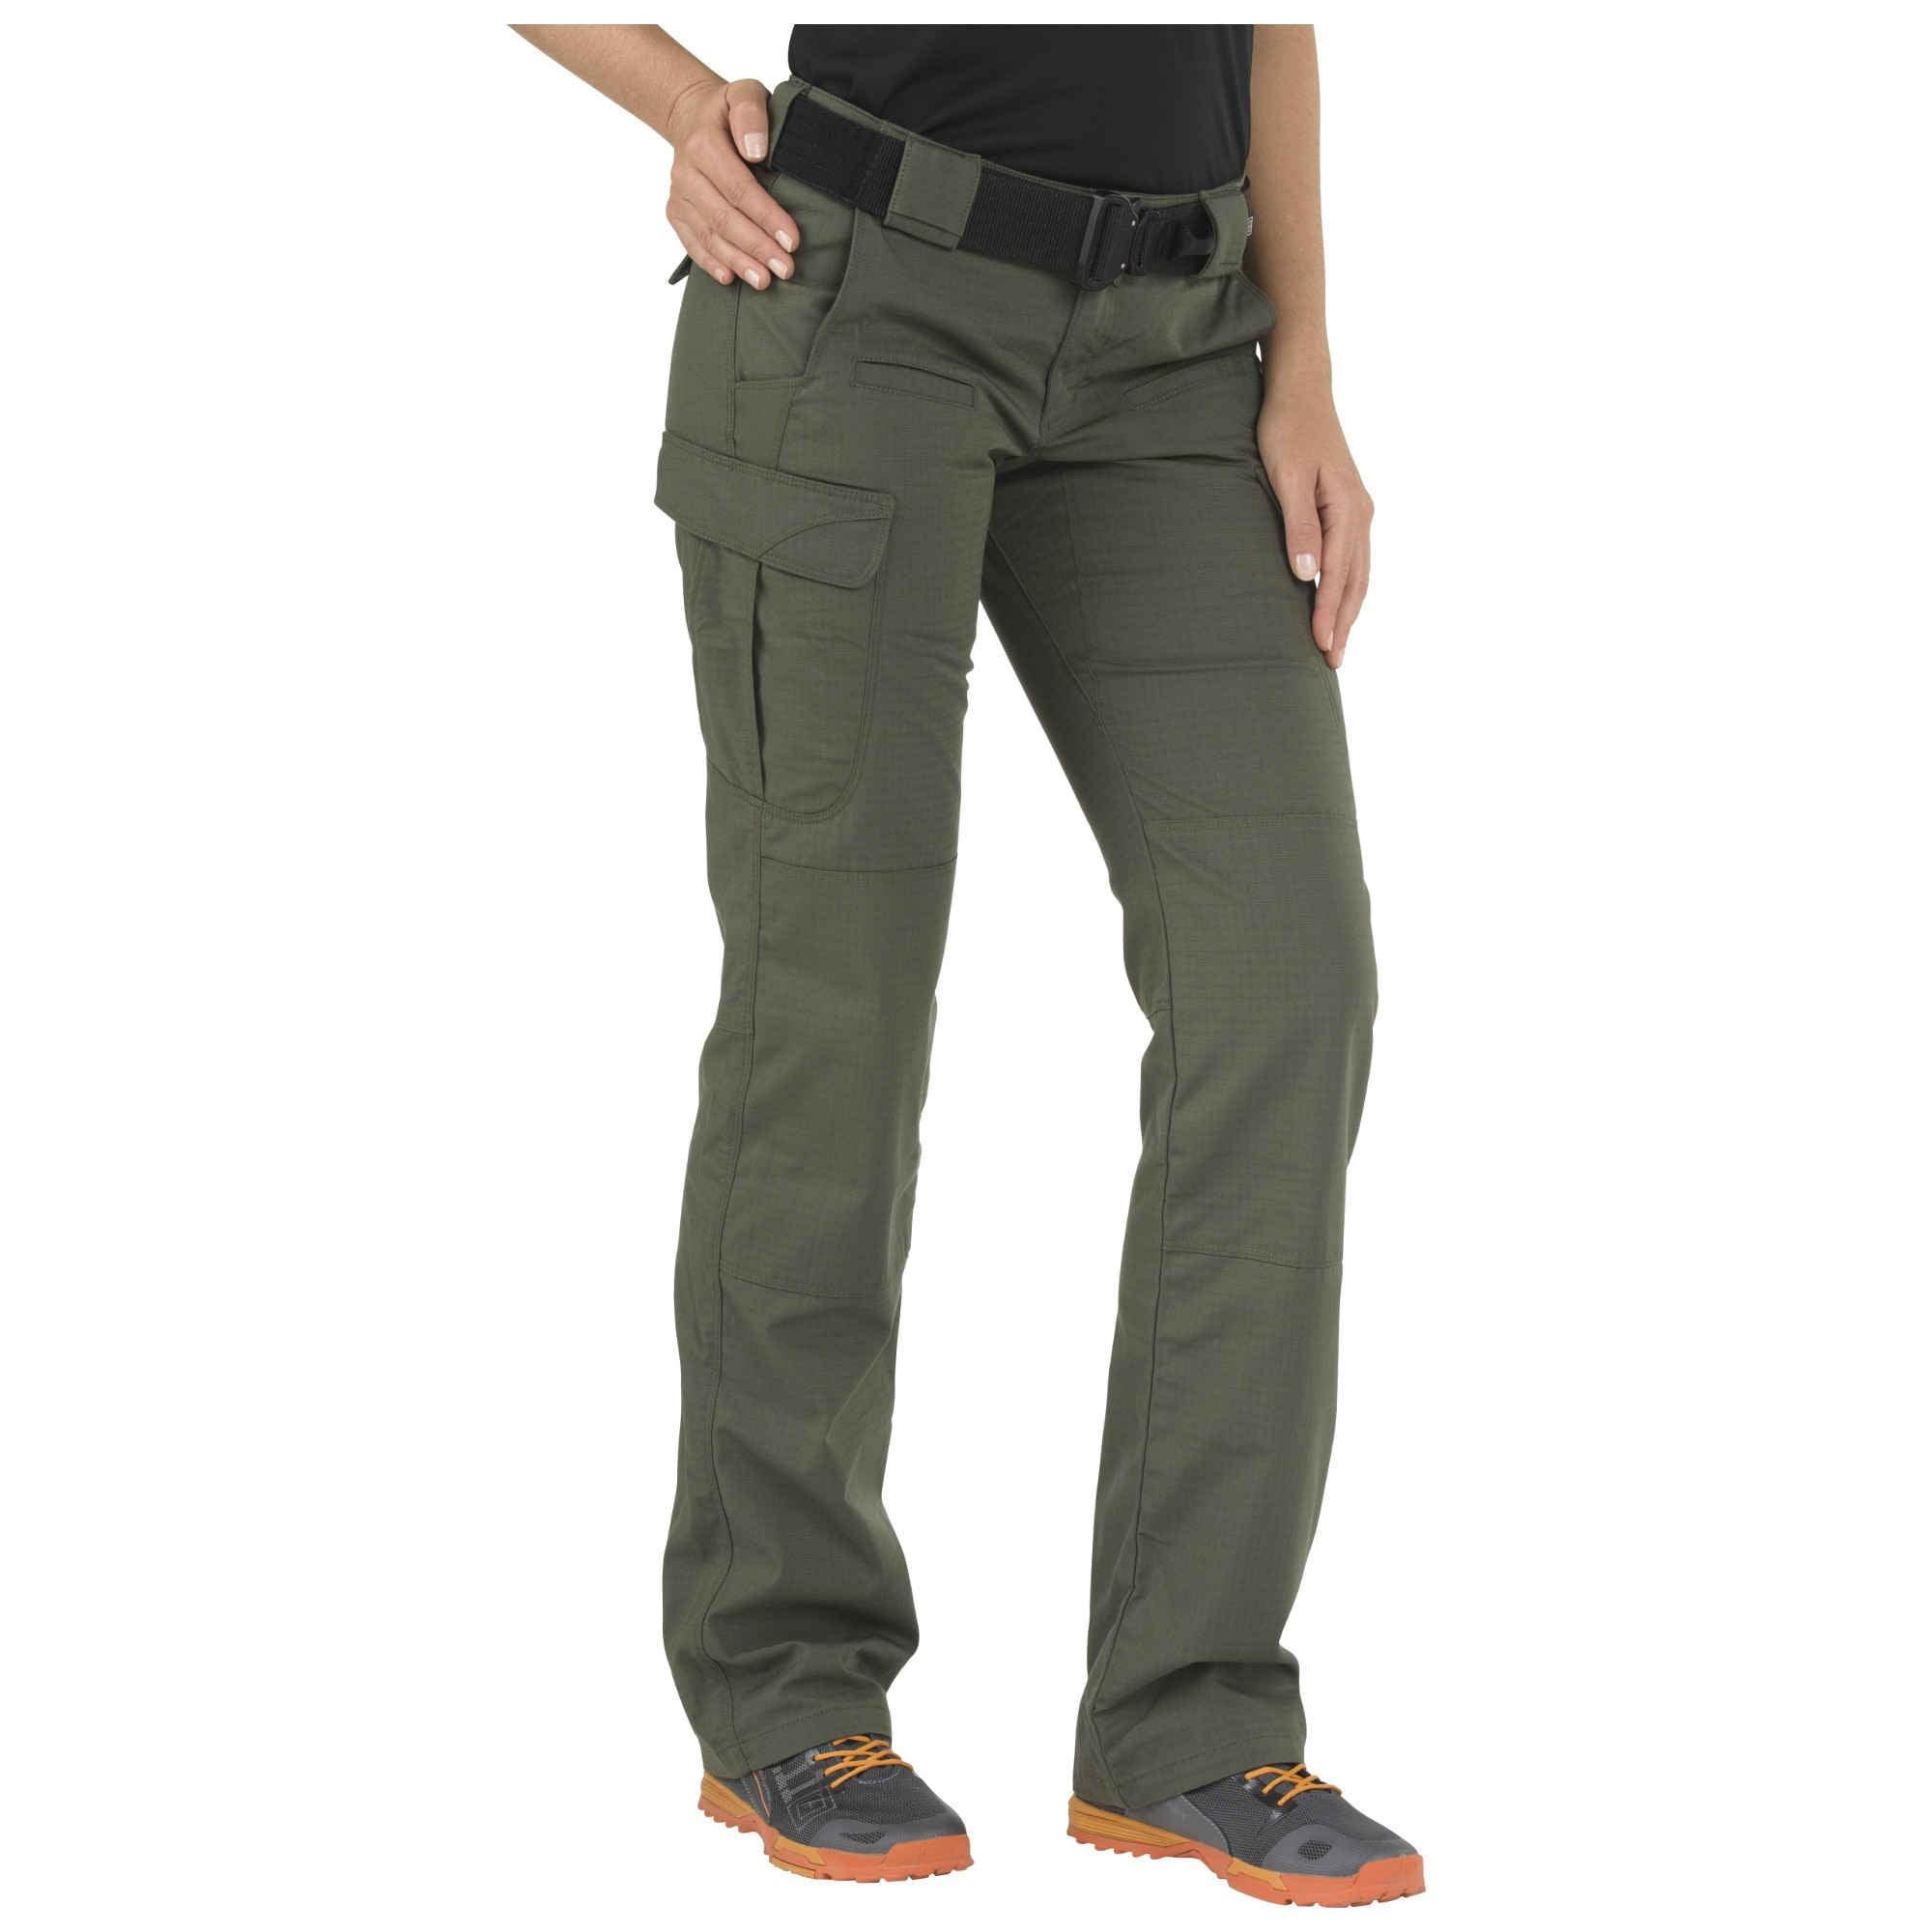 5.11 INC Tactical 5.11 Women Stryke Pants